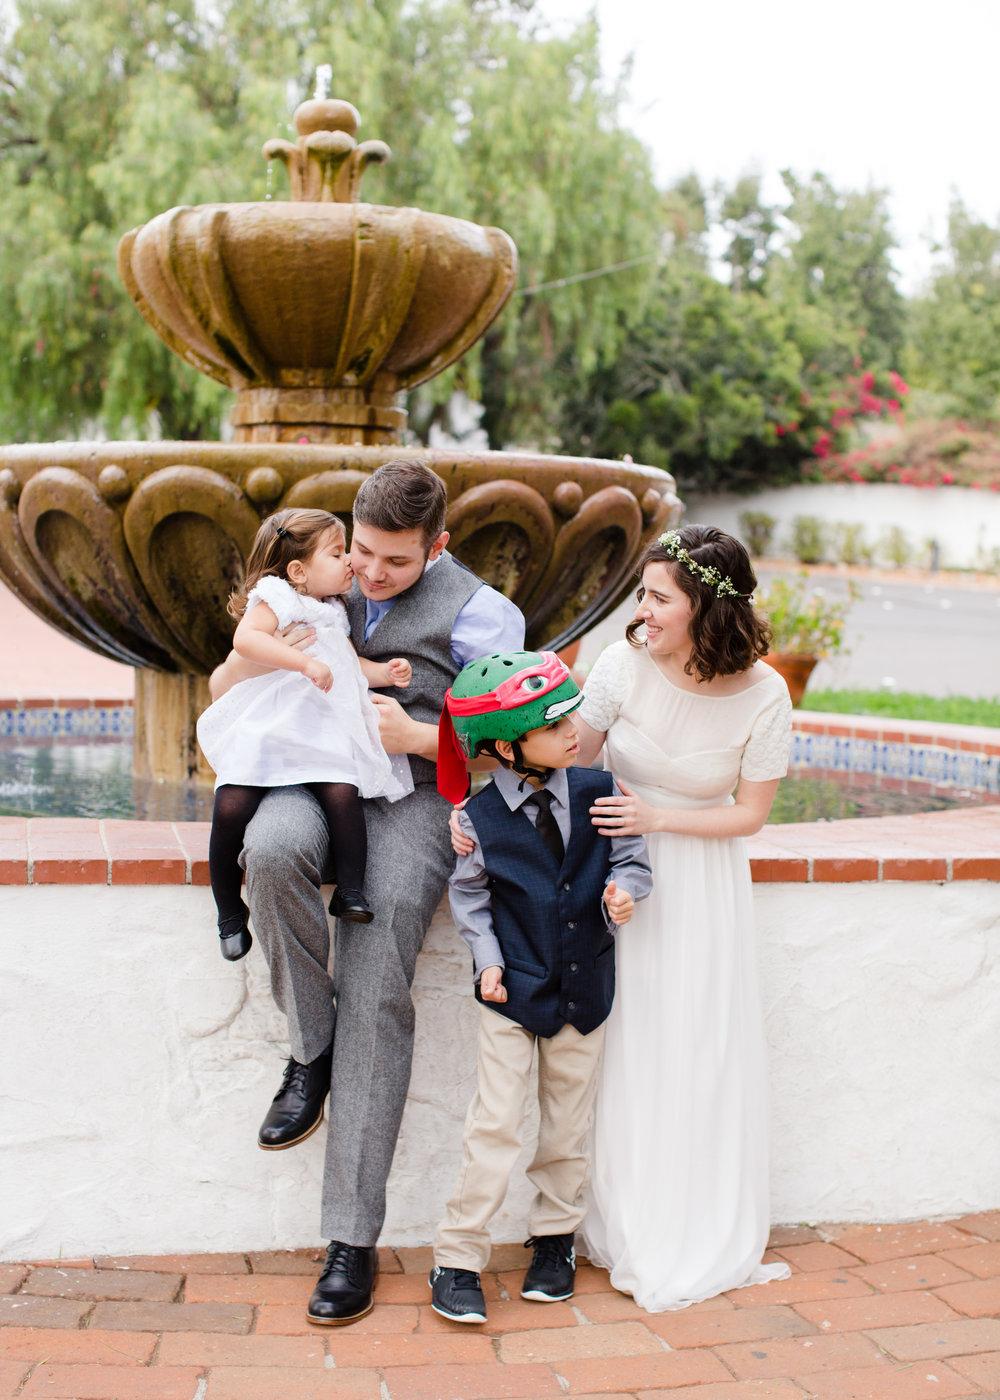 katherine_beth_photography_san_diego_photographer_San_diego_wedding_photographer_san_diego_mission_026.jpg